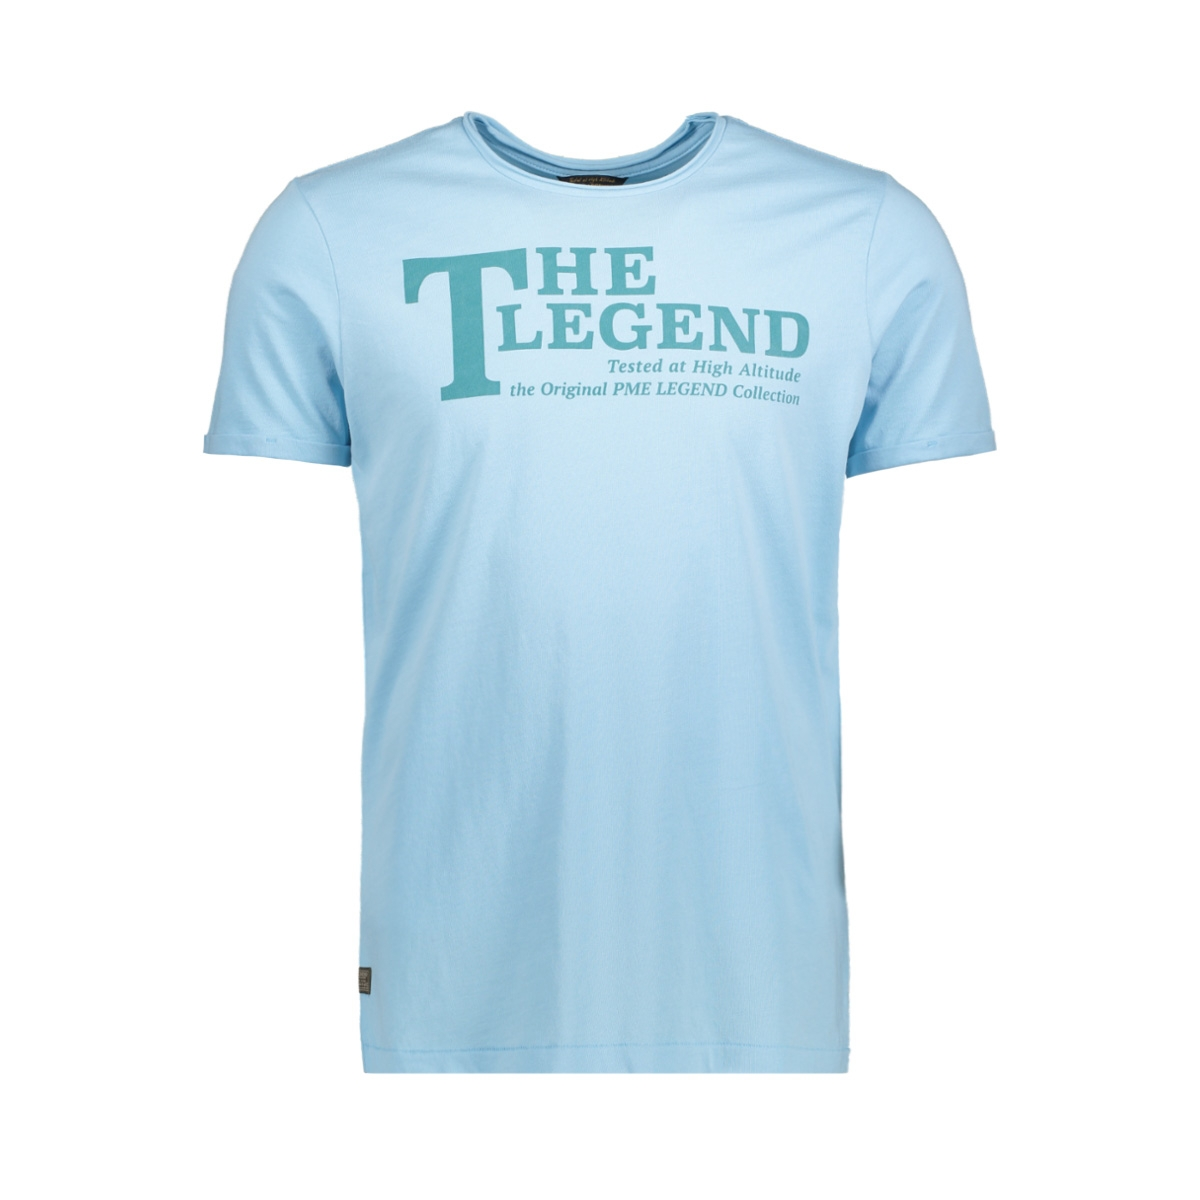 ptss184571 pme legend t-shirt 4295